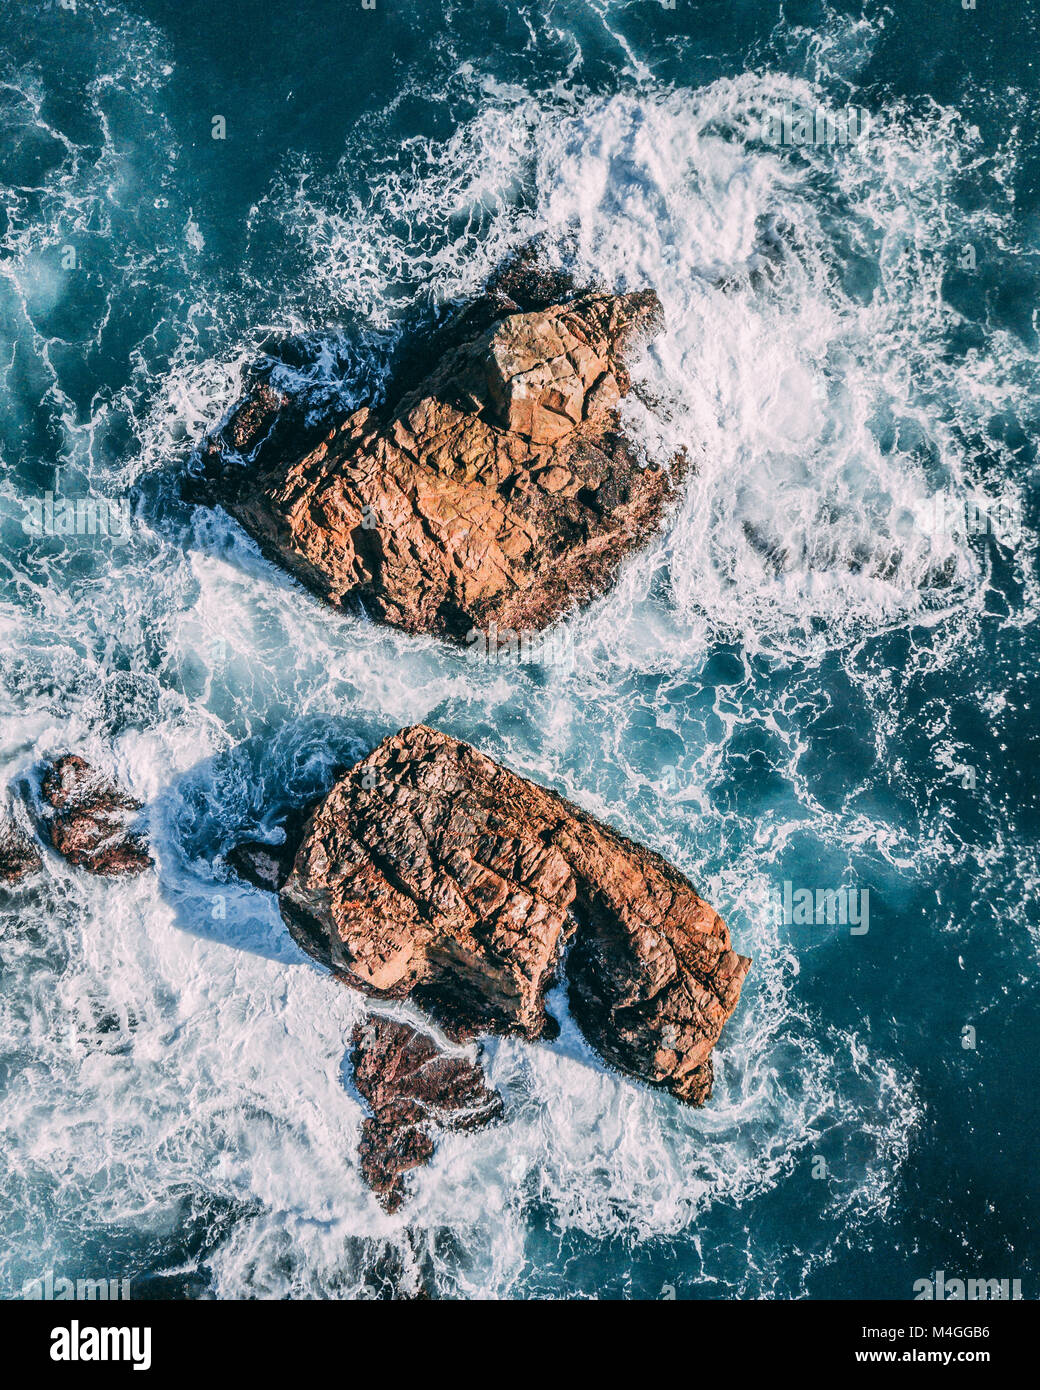 An aerial view of California Coastal Rocks - Stock Image